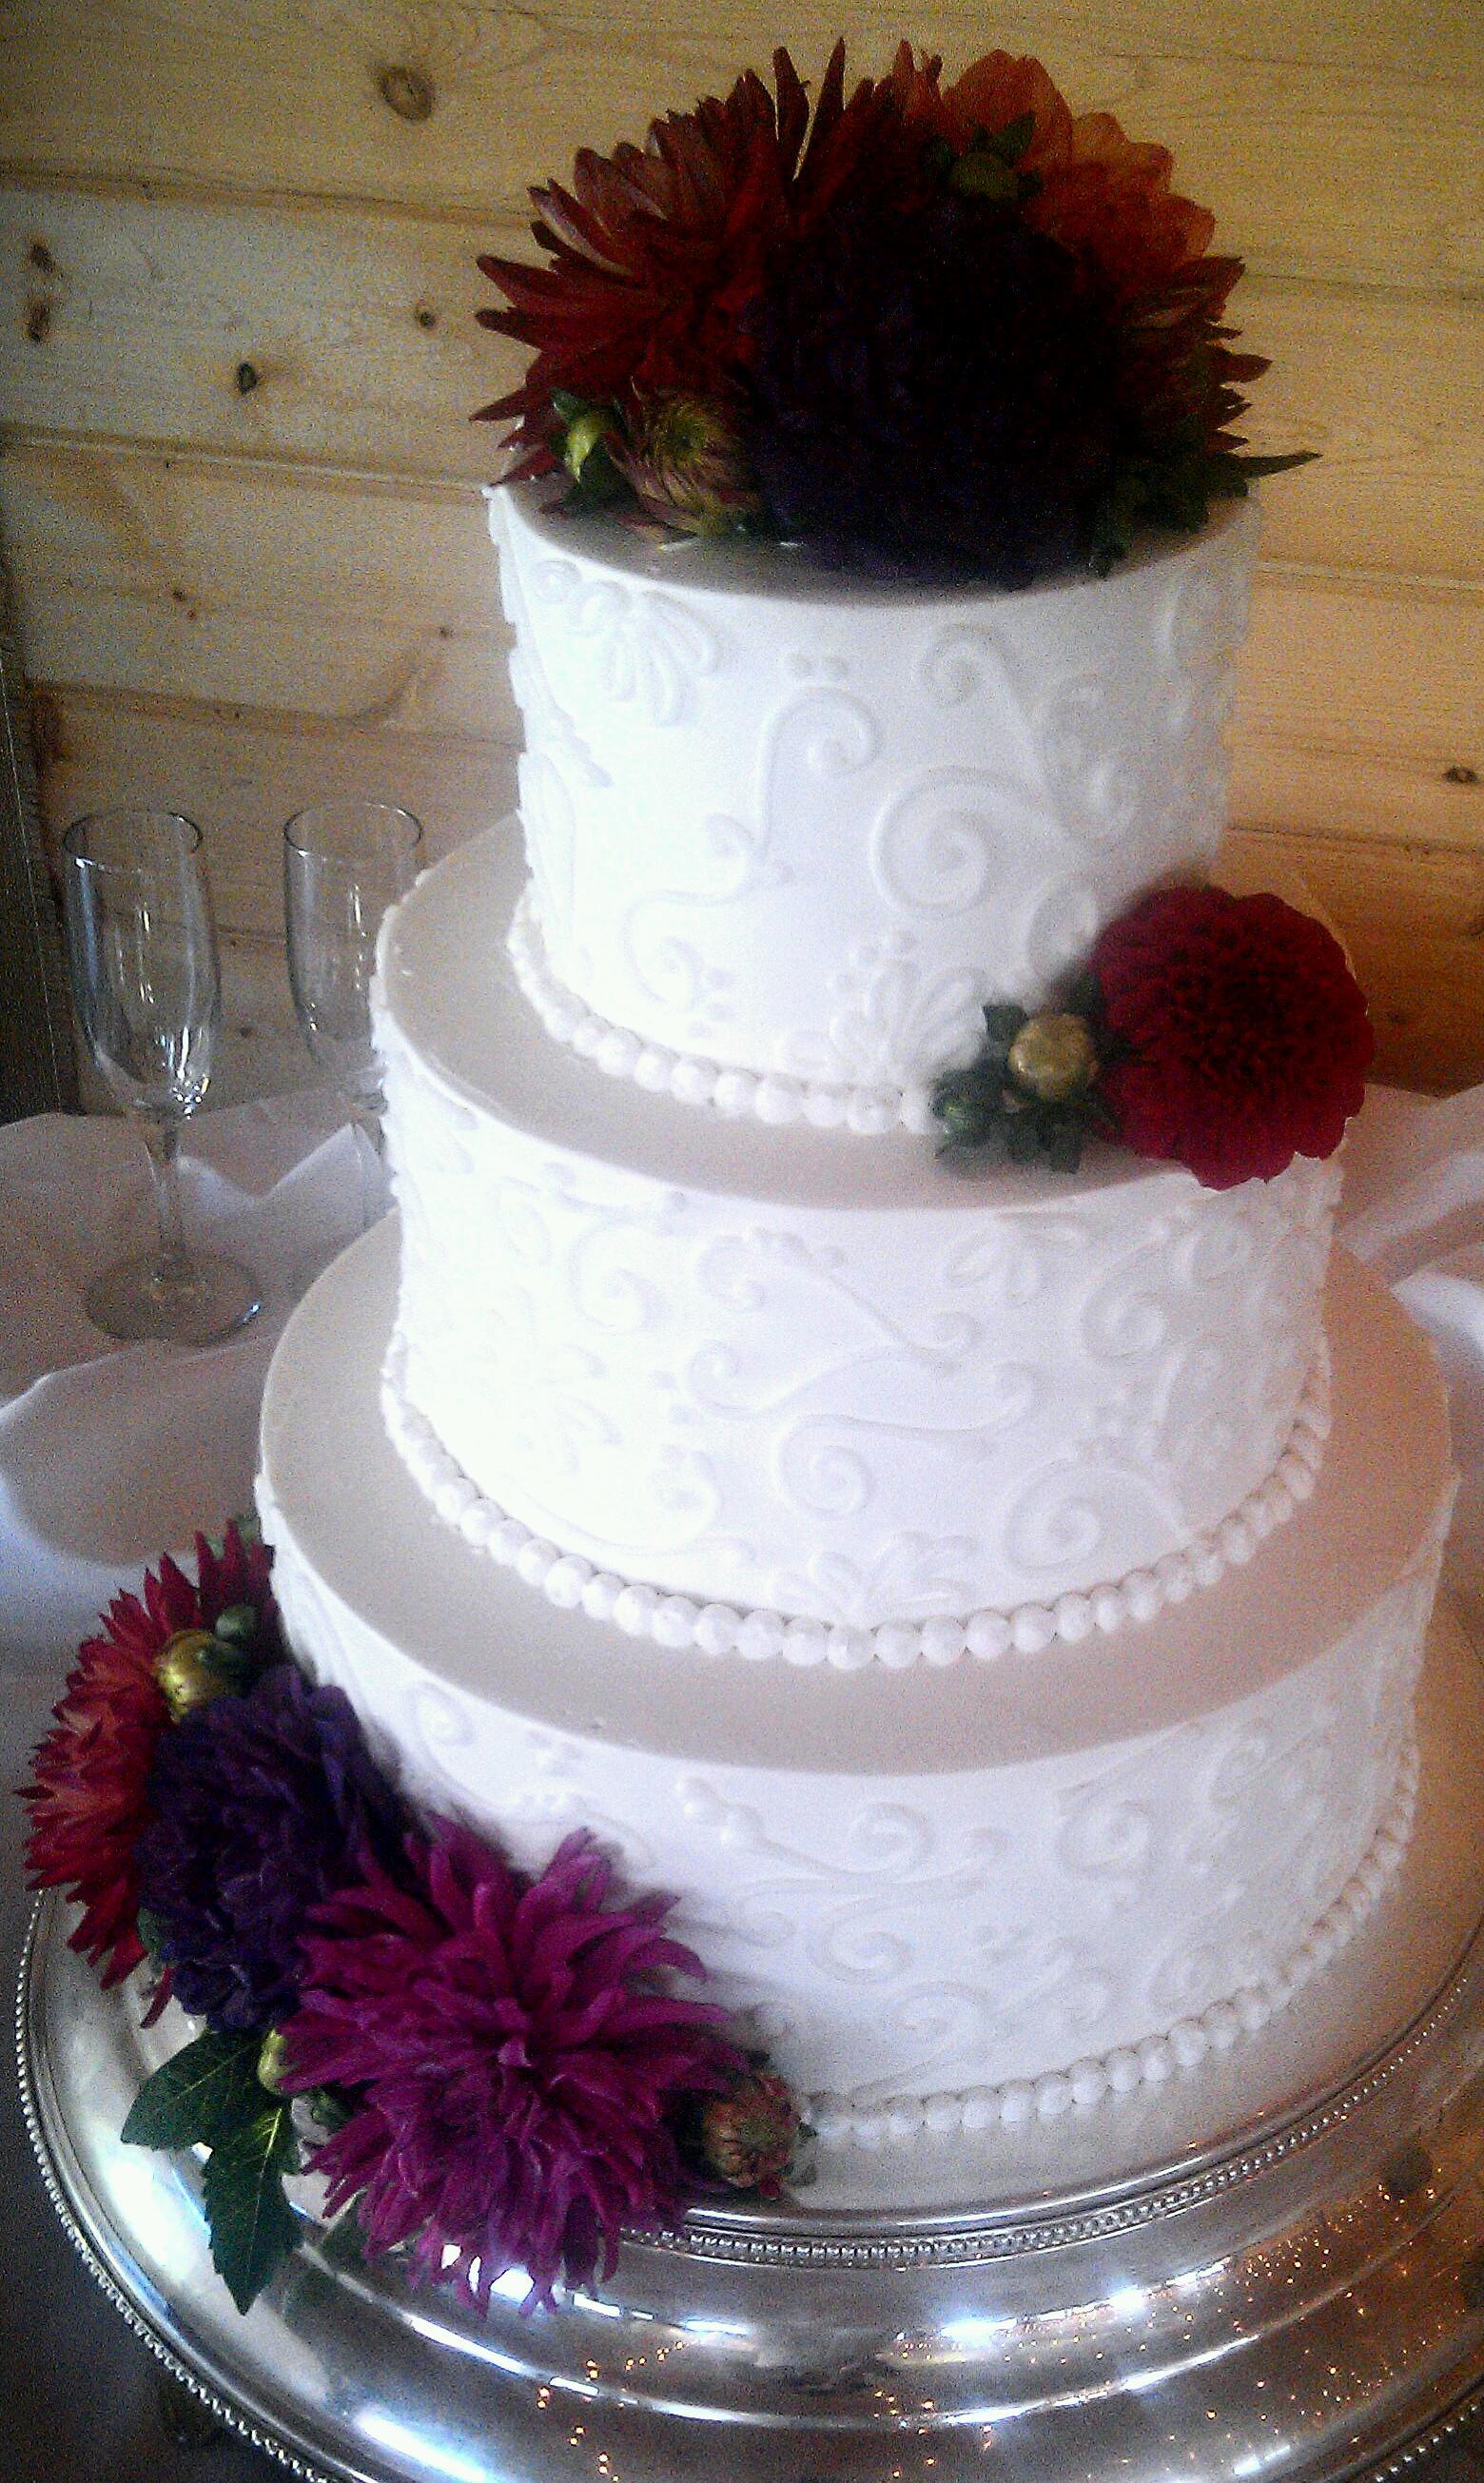 bc-wed-cake3.jpg